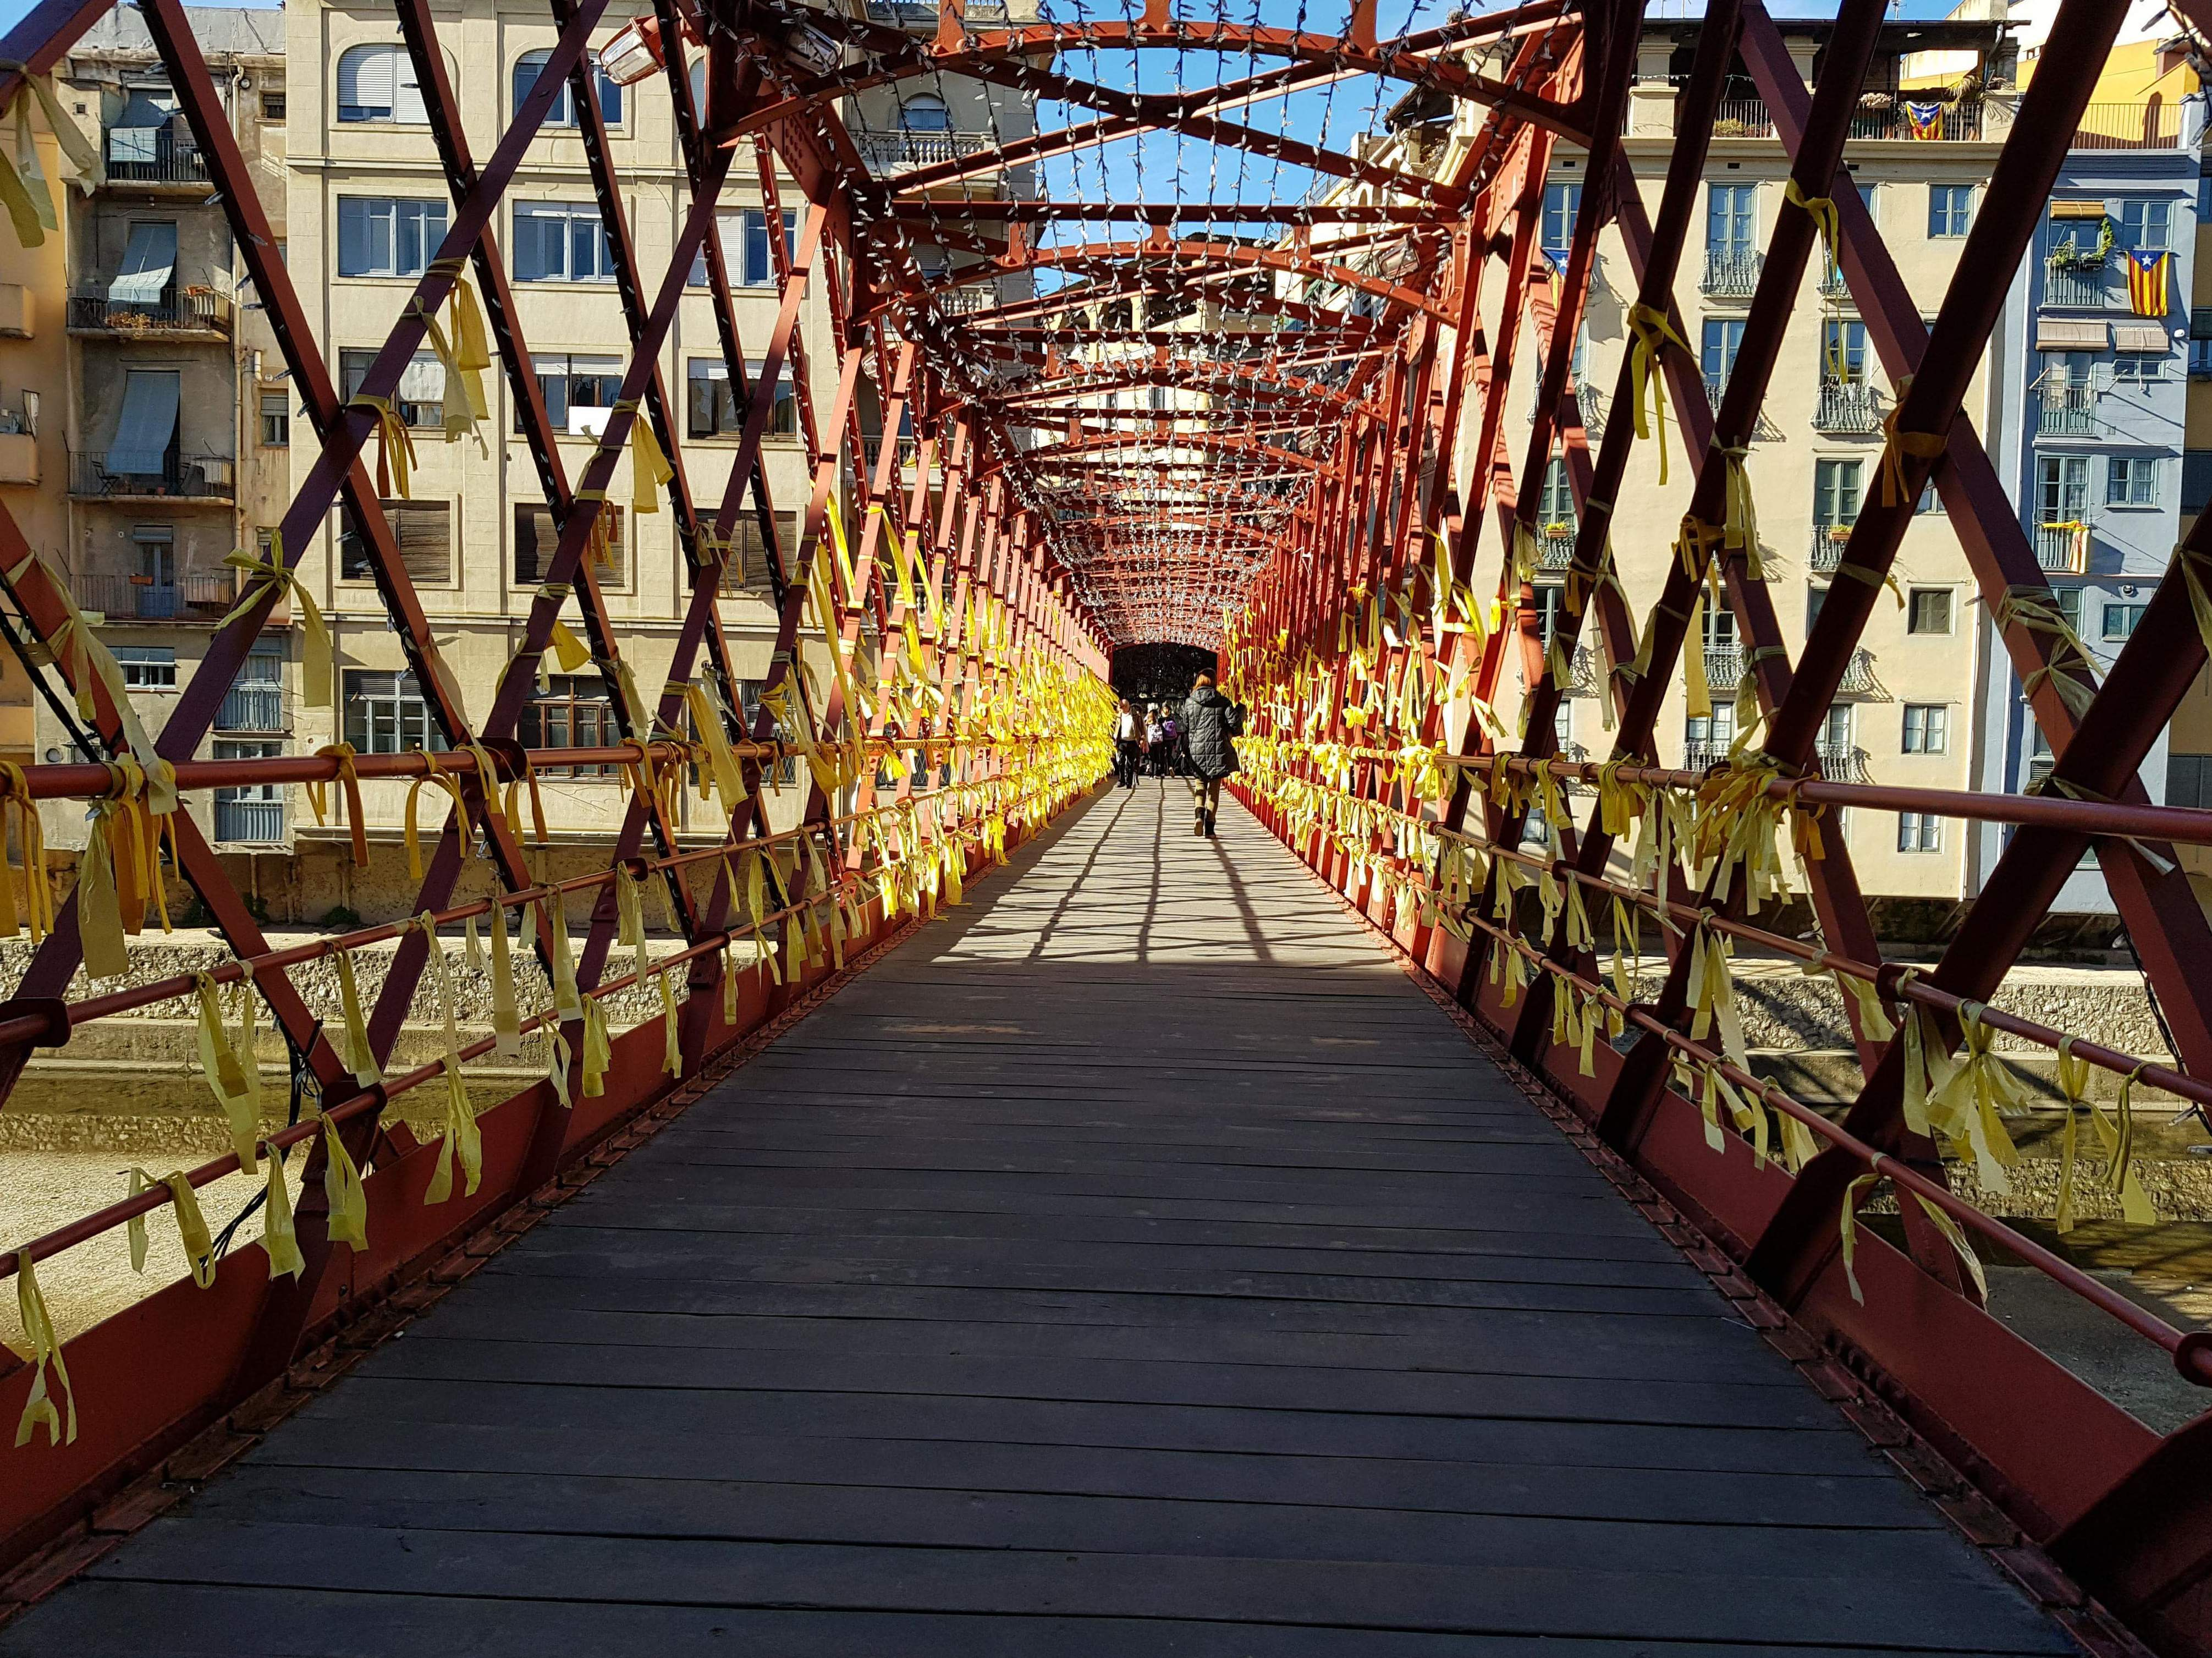 Puente hierro Girona